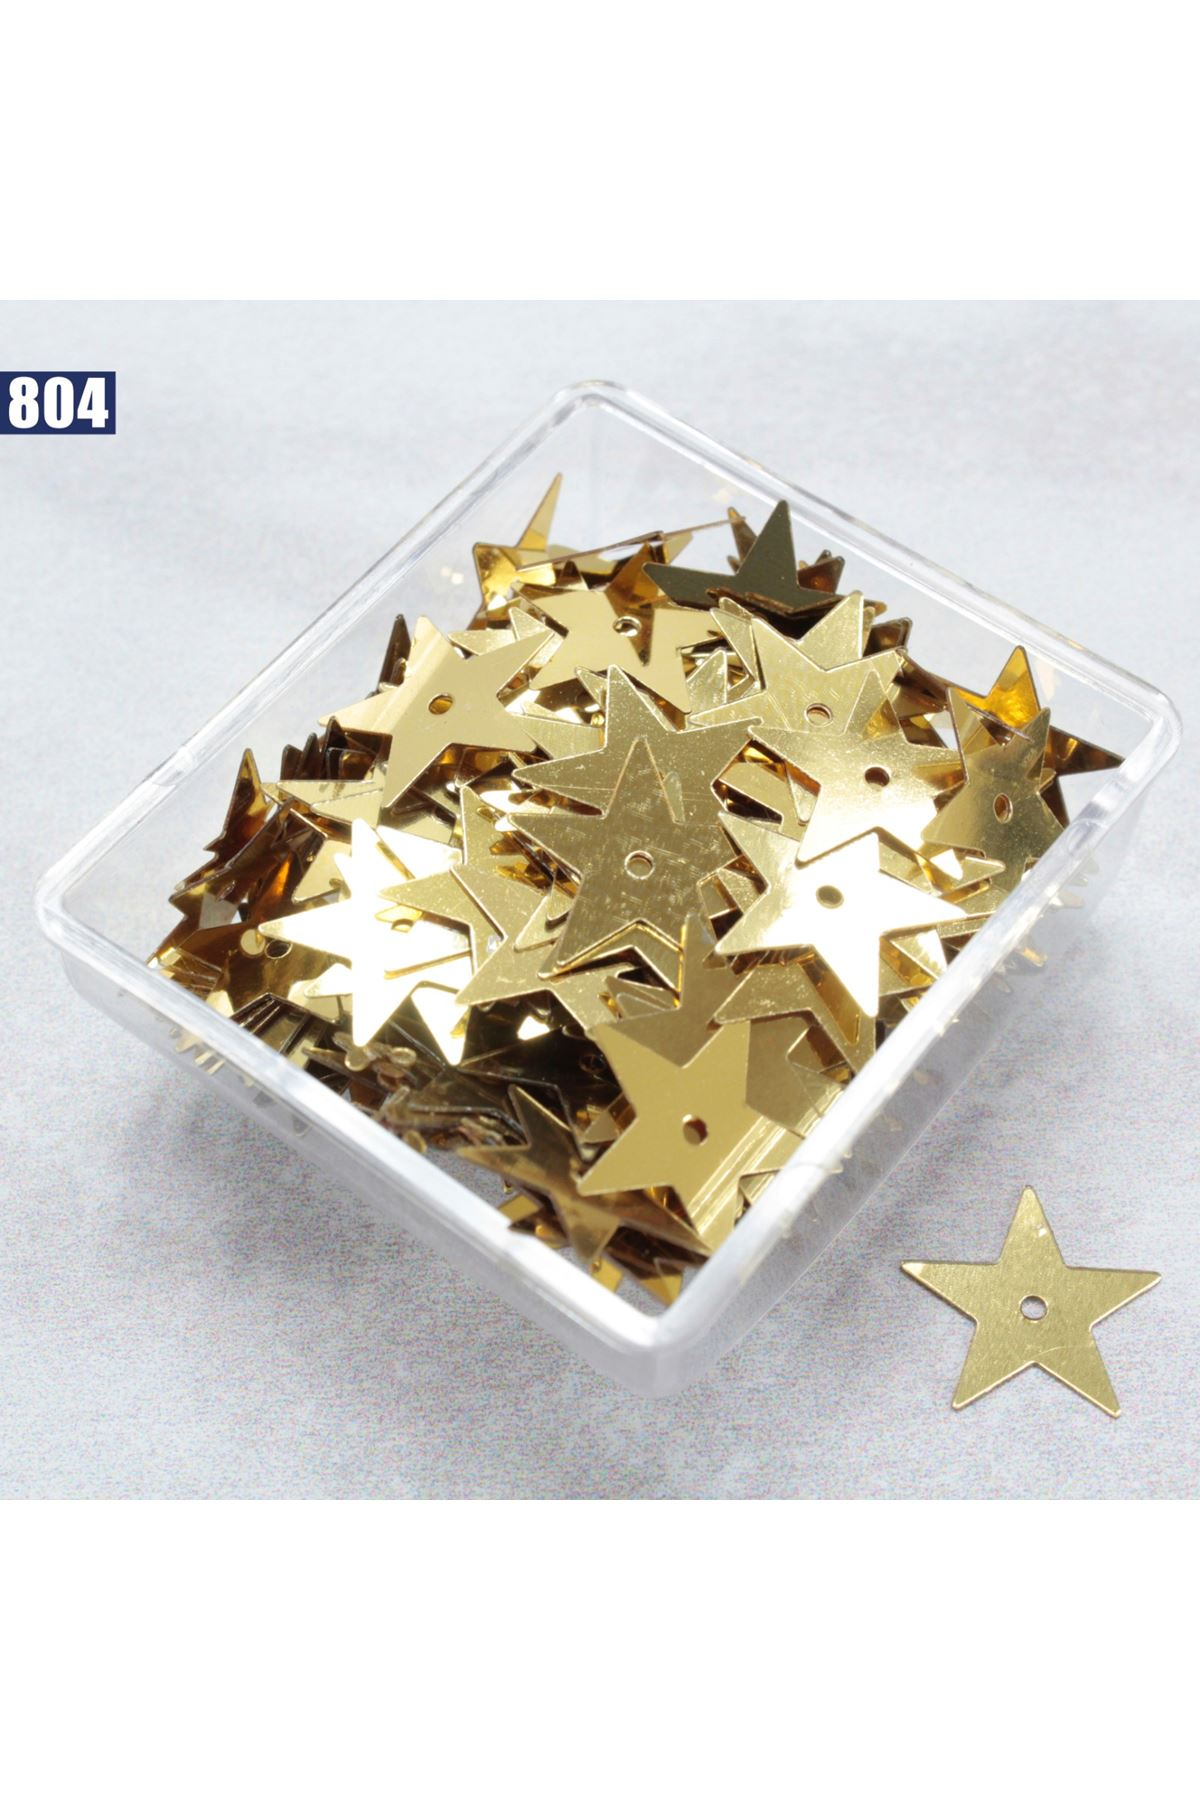 Pul 10 gram - 804